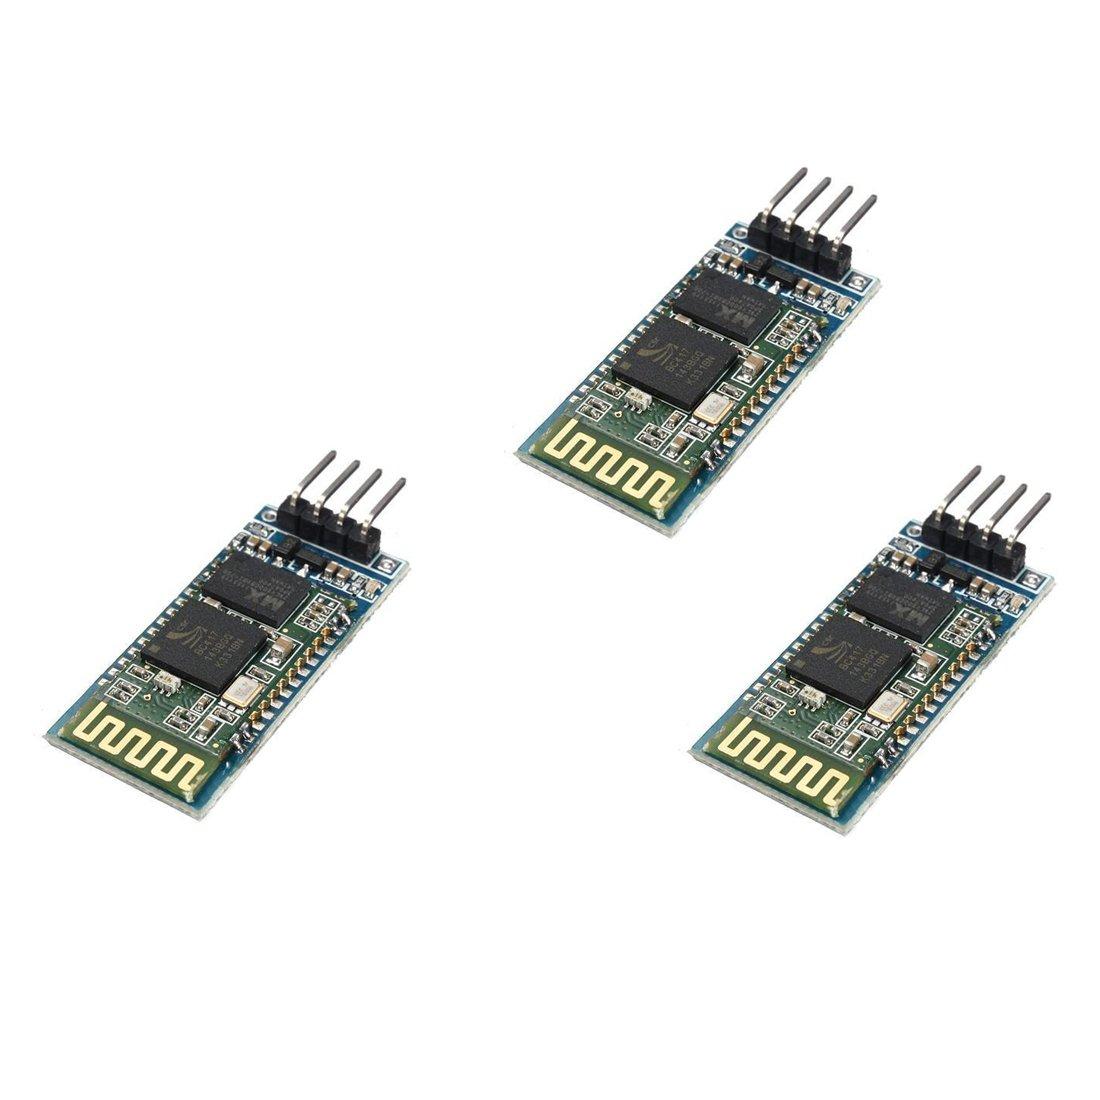 SODIAL R 3 Pcs JY-MCU HC-06 Arduino Wireless Bluetooth Serial RF 5V Transceiver Module